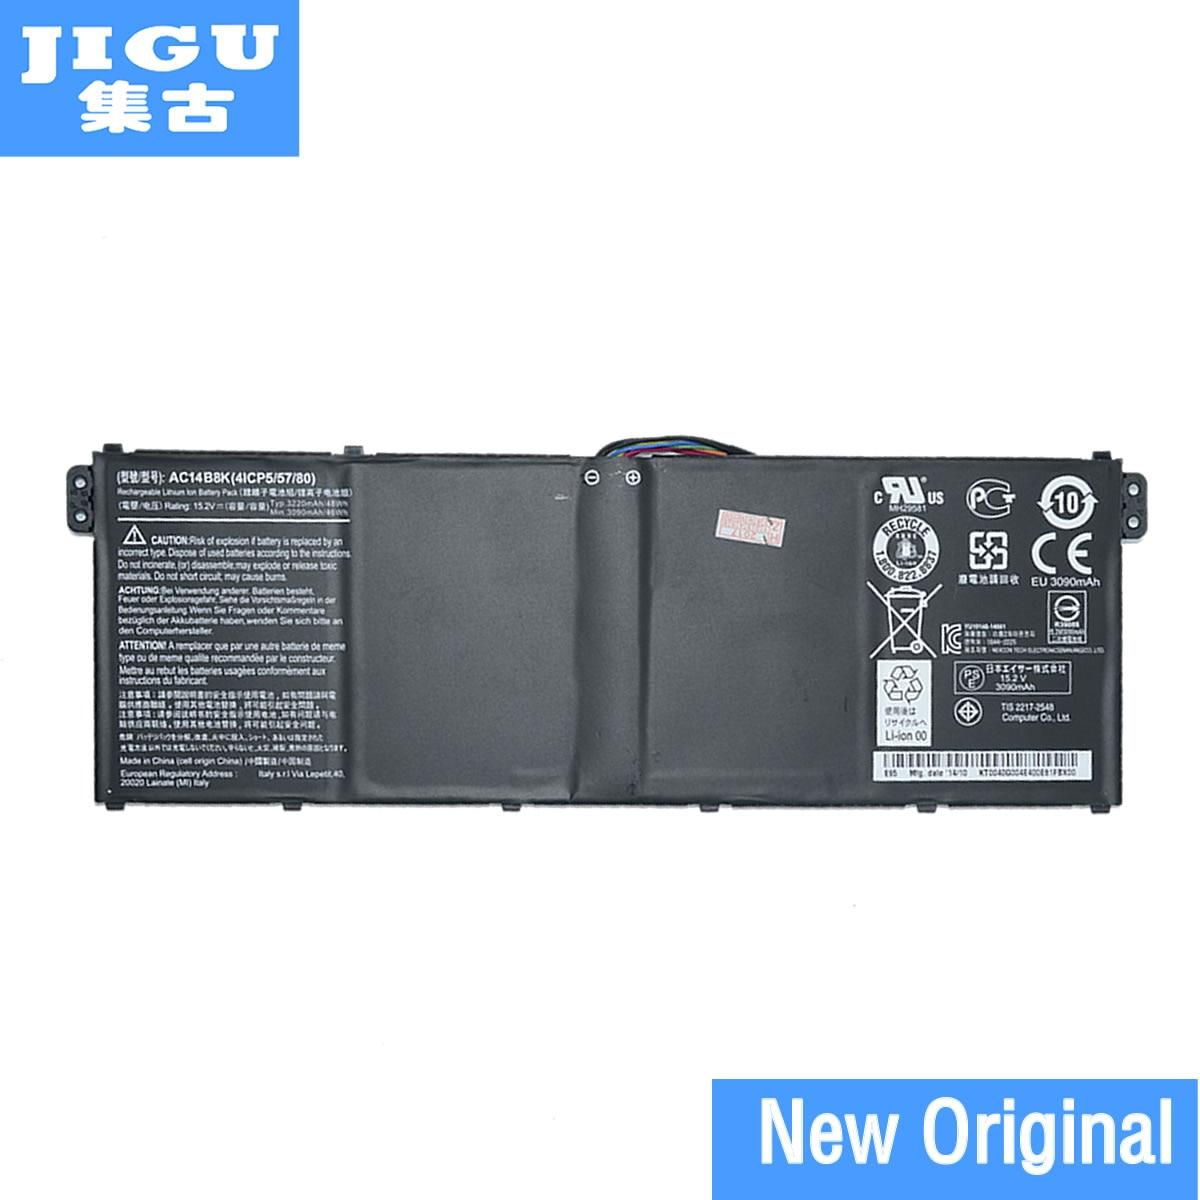 JIGU New Original 15.2V 48Wh Laptop Battery For Acer For Aspire V3 V3-371 V3-371-30FA AC14B8K